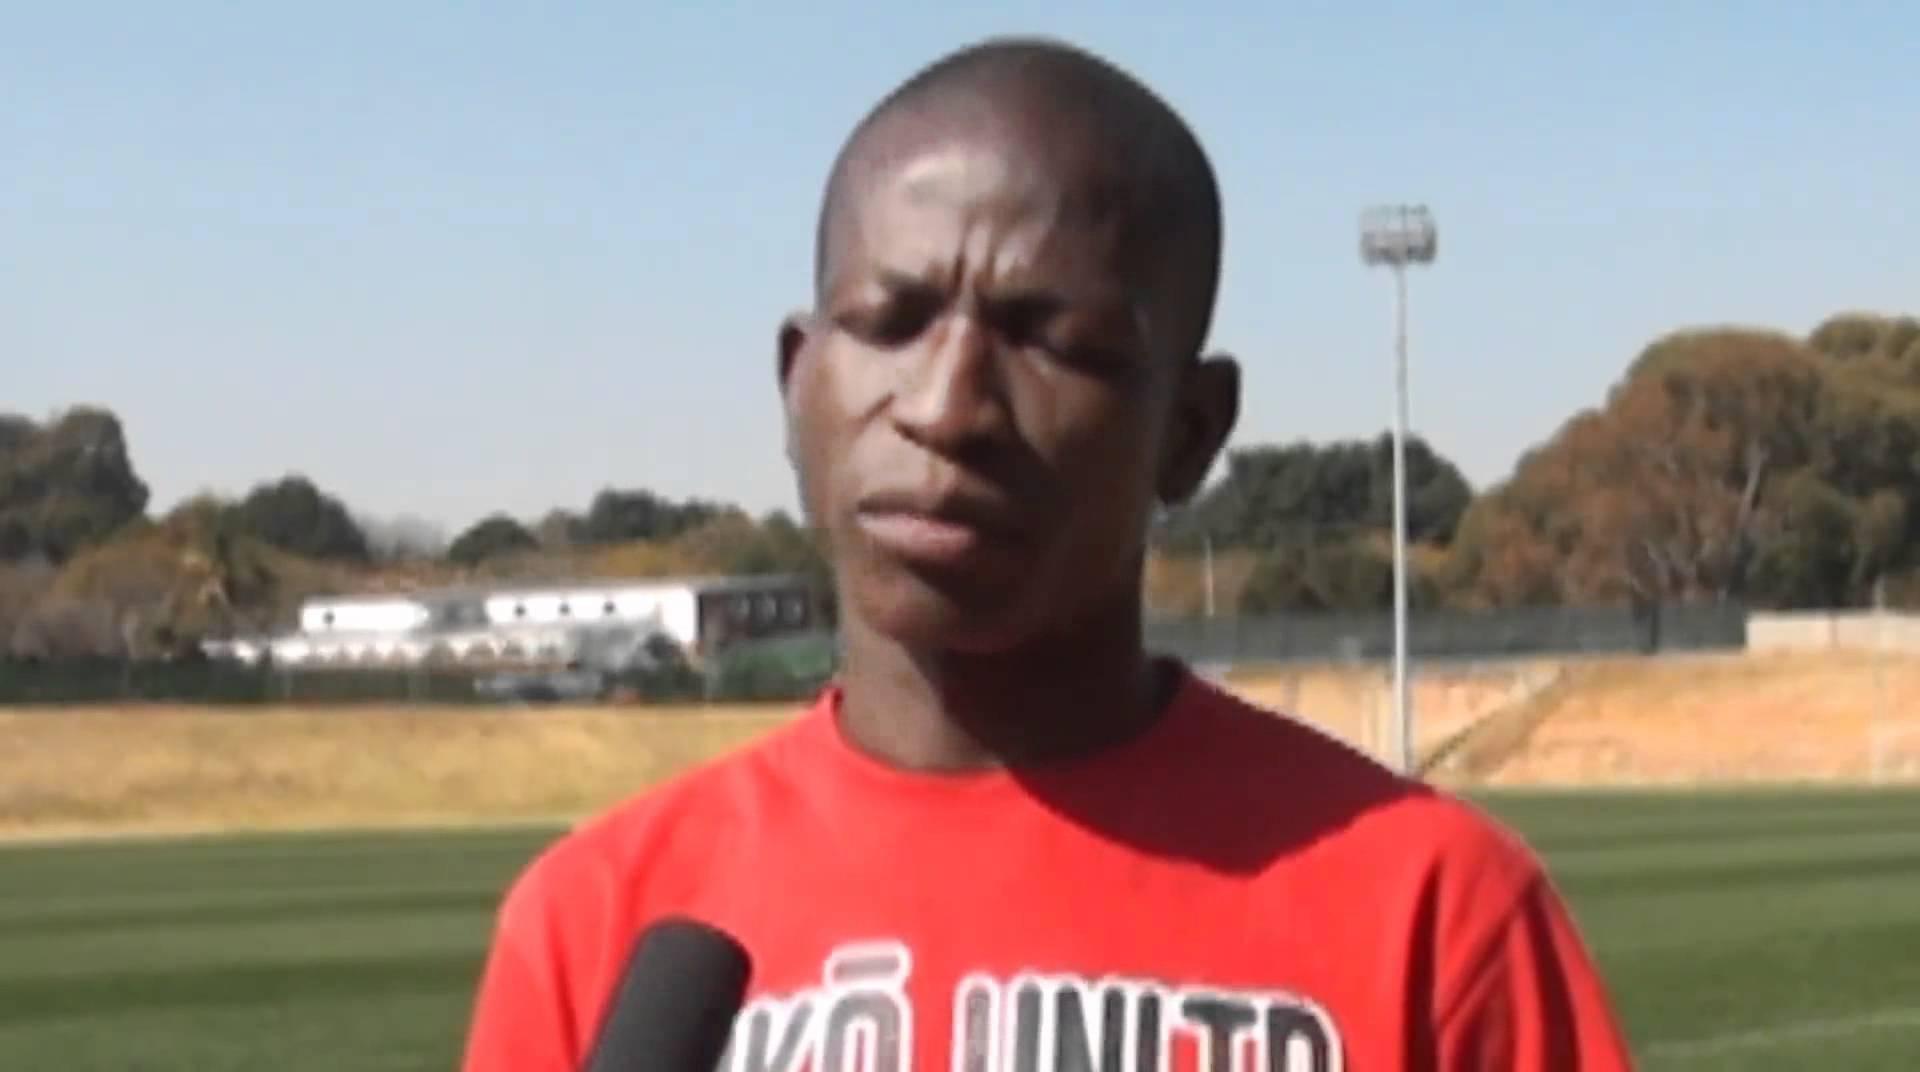 Thomas Sweswe set to retire